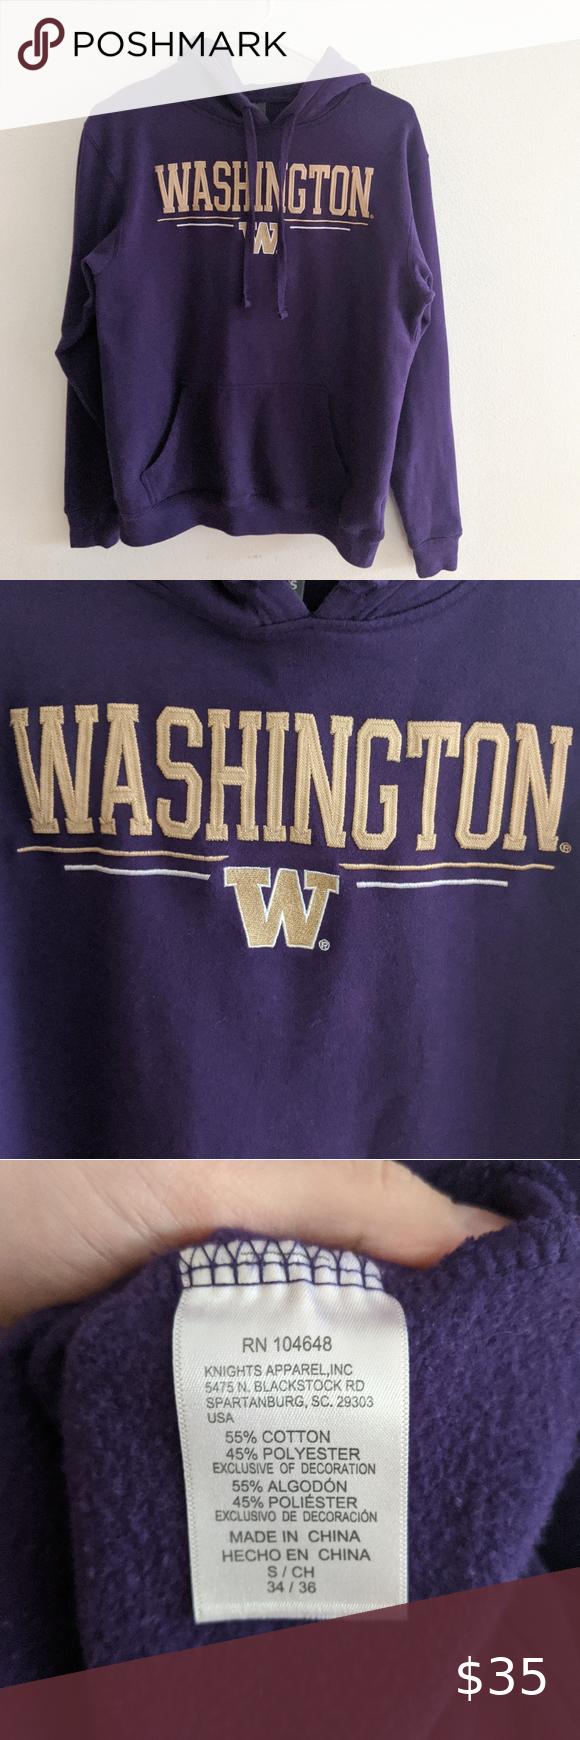 University Of Washington Huskies Hoodie Sweatshirt Sweatshirts Hoodie Hoodies Sweatshirts [ 1740 x 580 Pixel ]